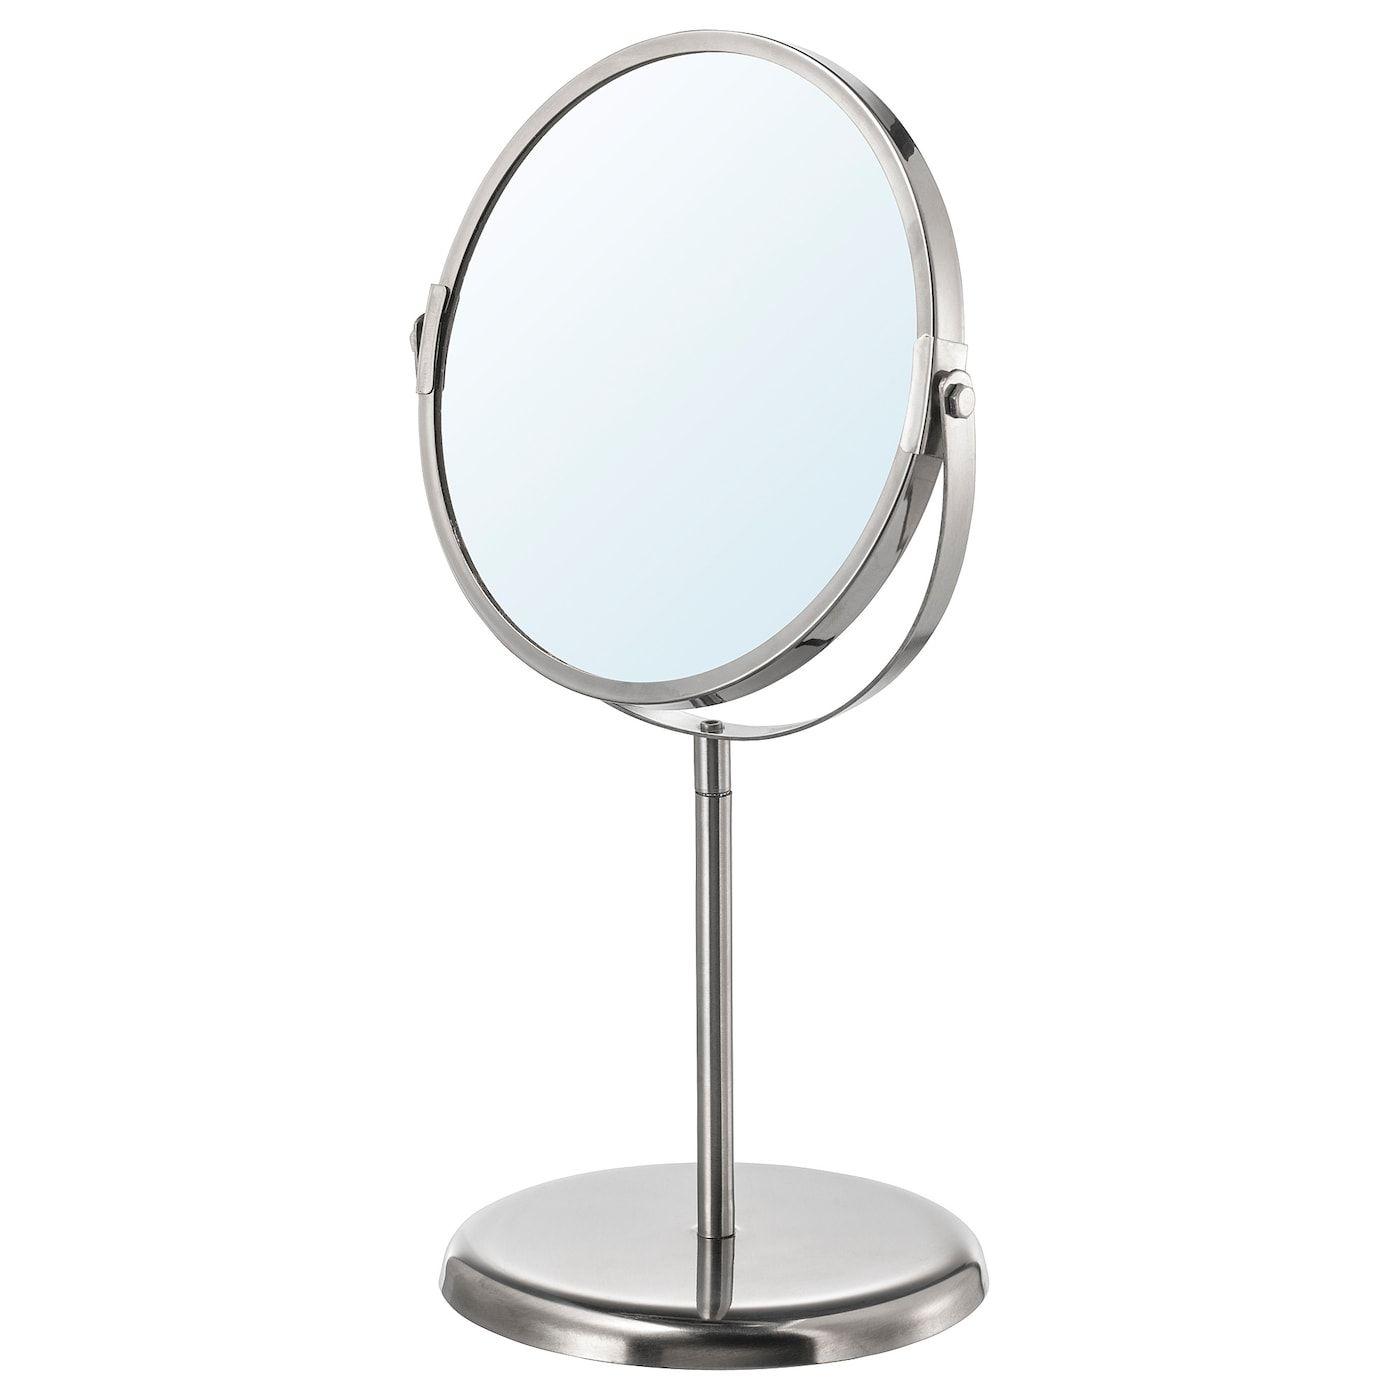 Trensum Mirror Stainless Steel In 2020 Mirror Magnifying